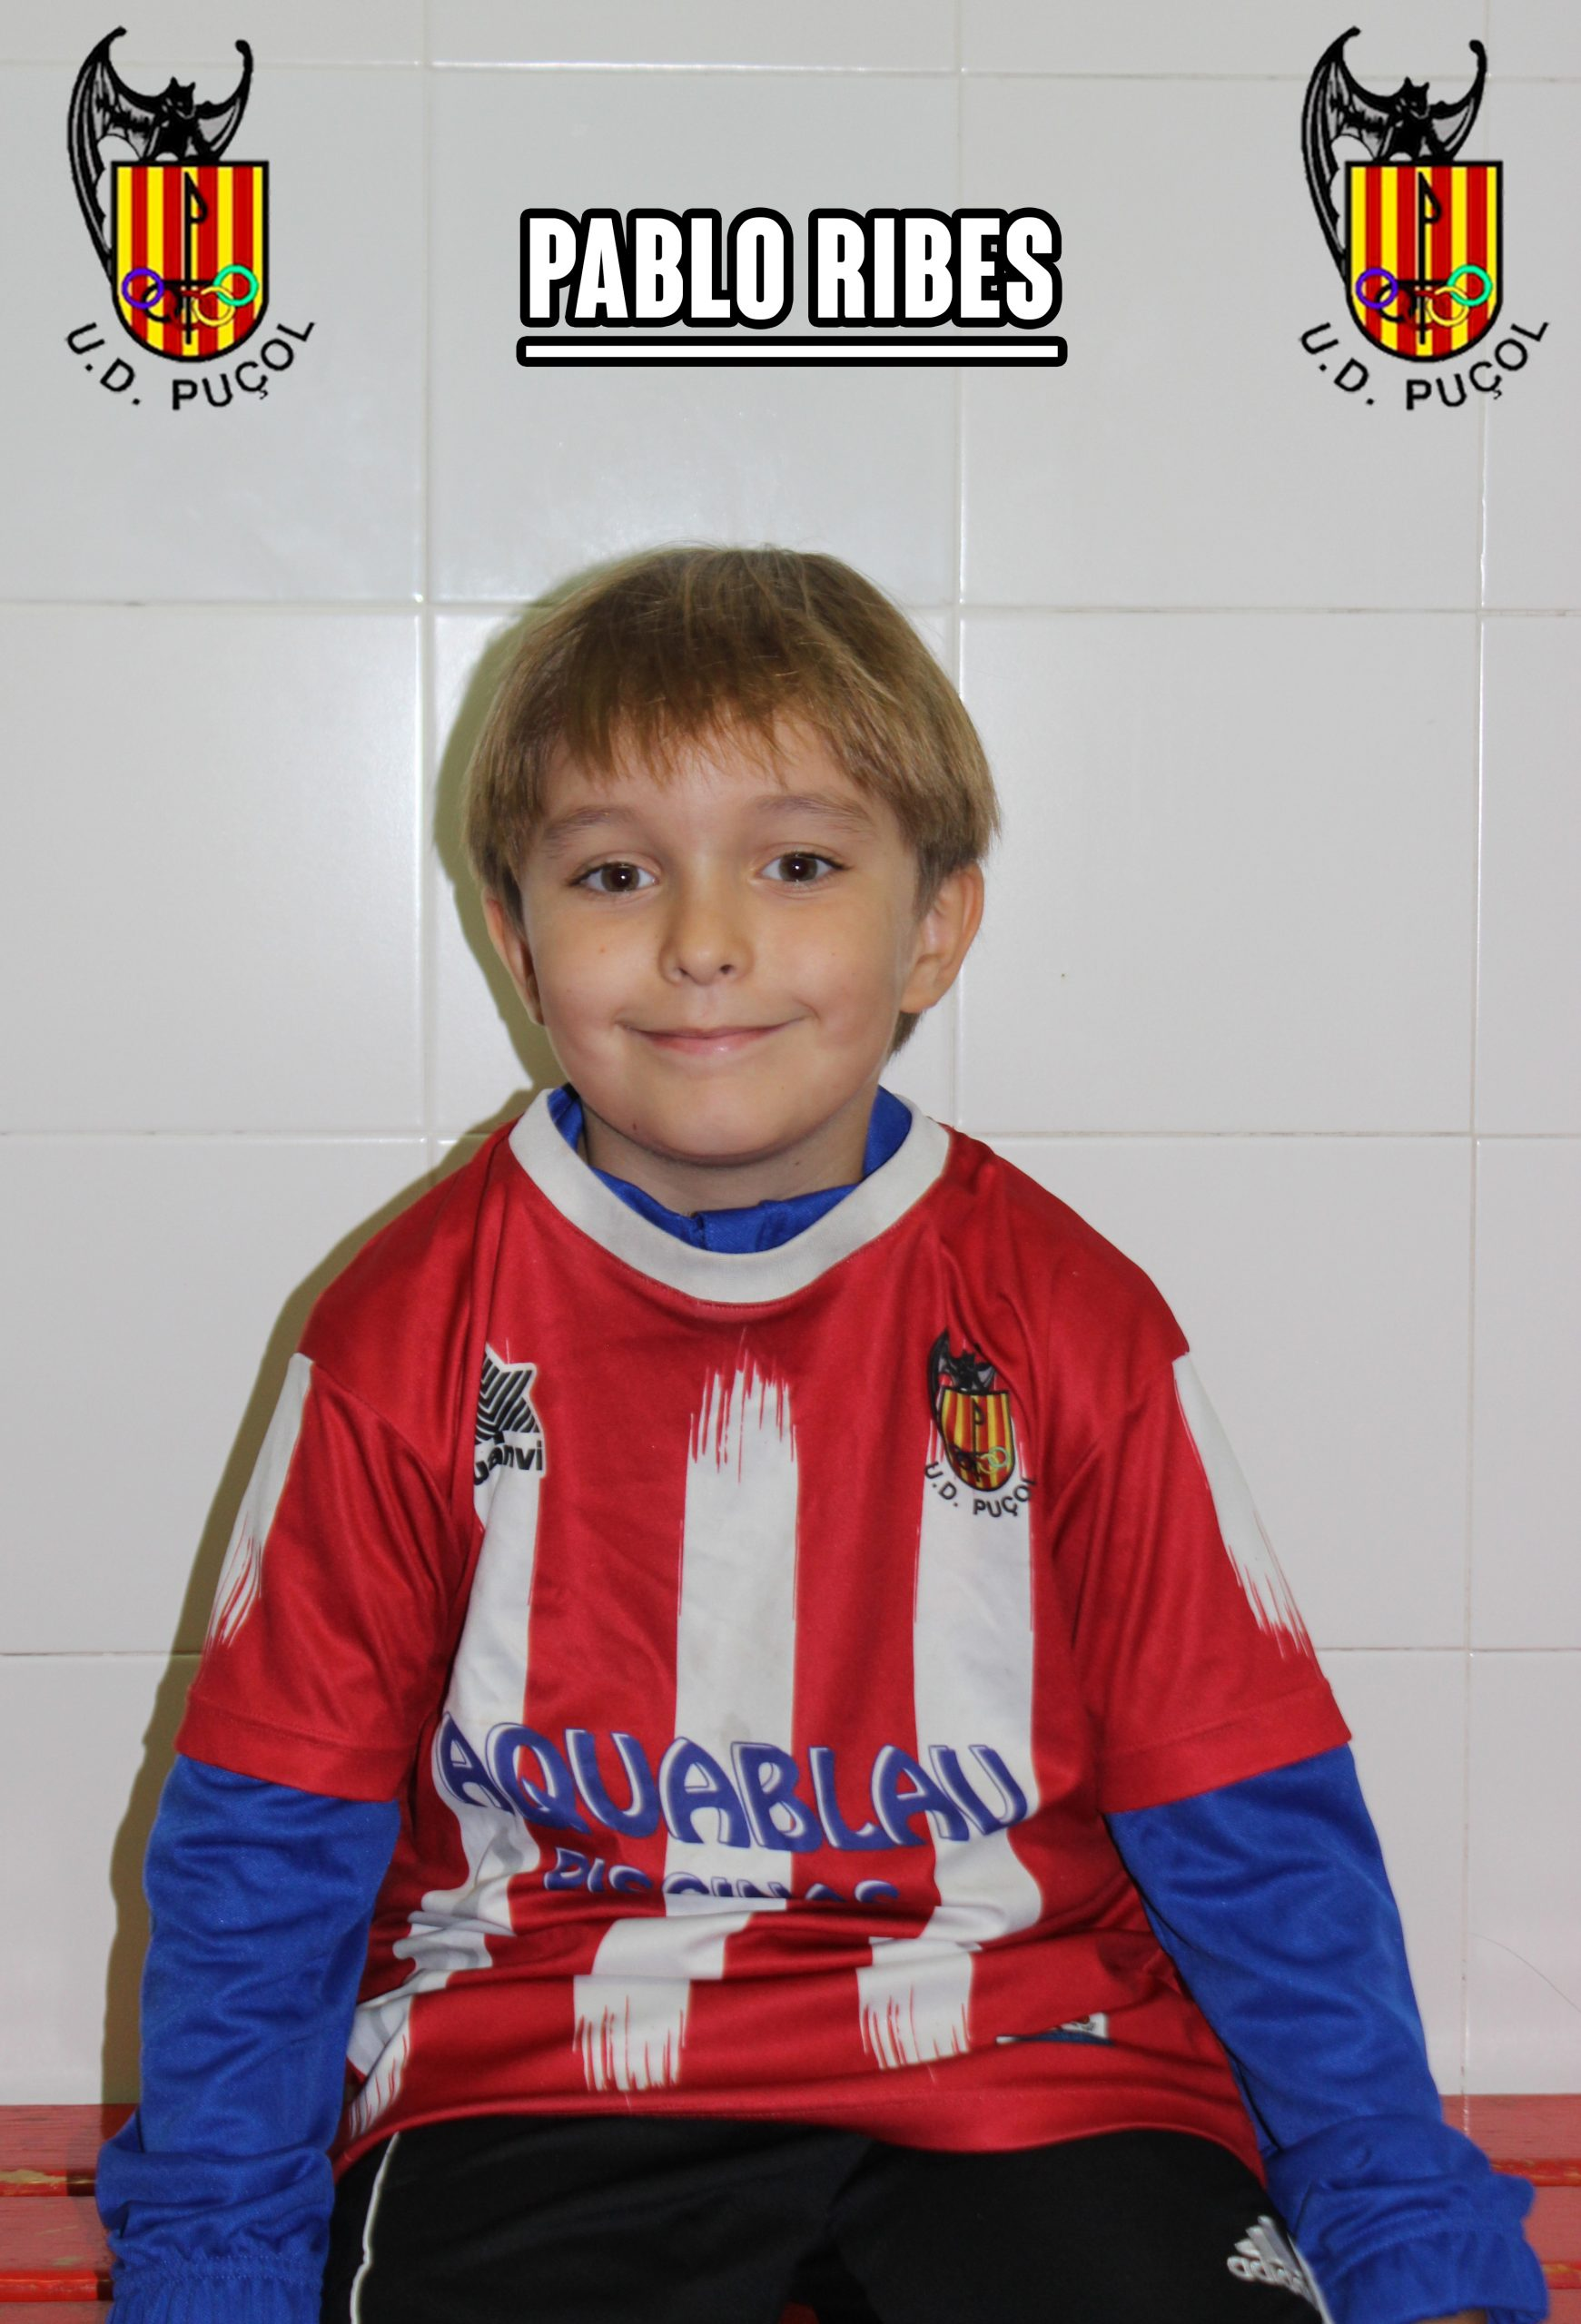 Pablo Ribes